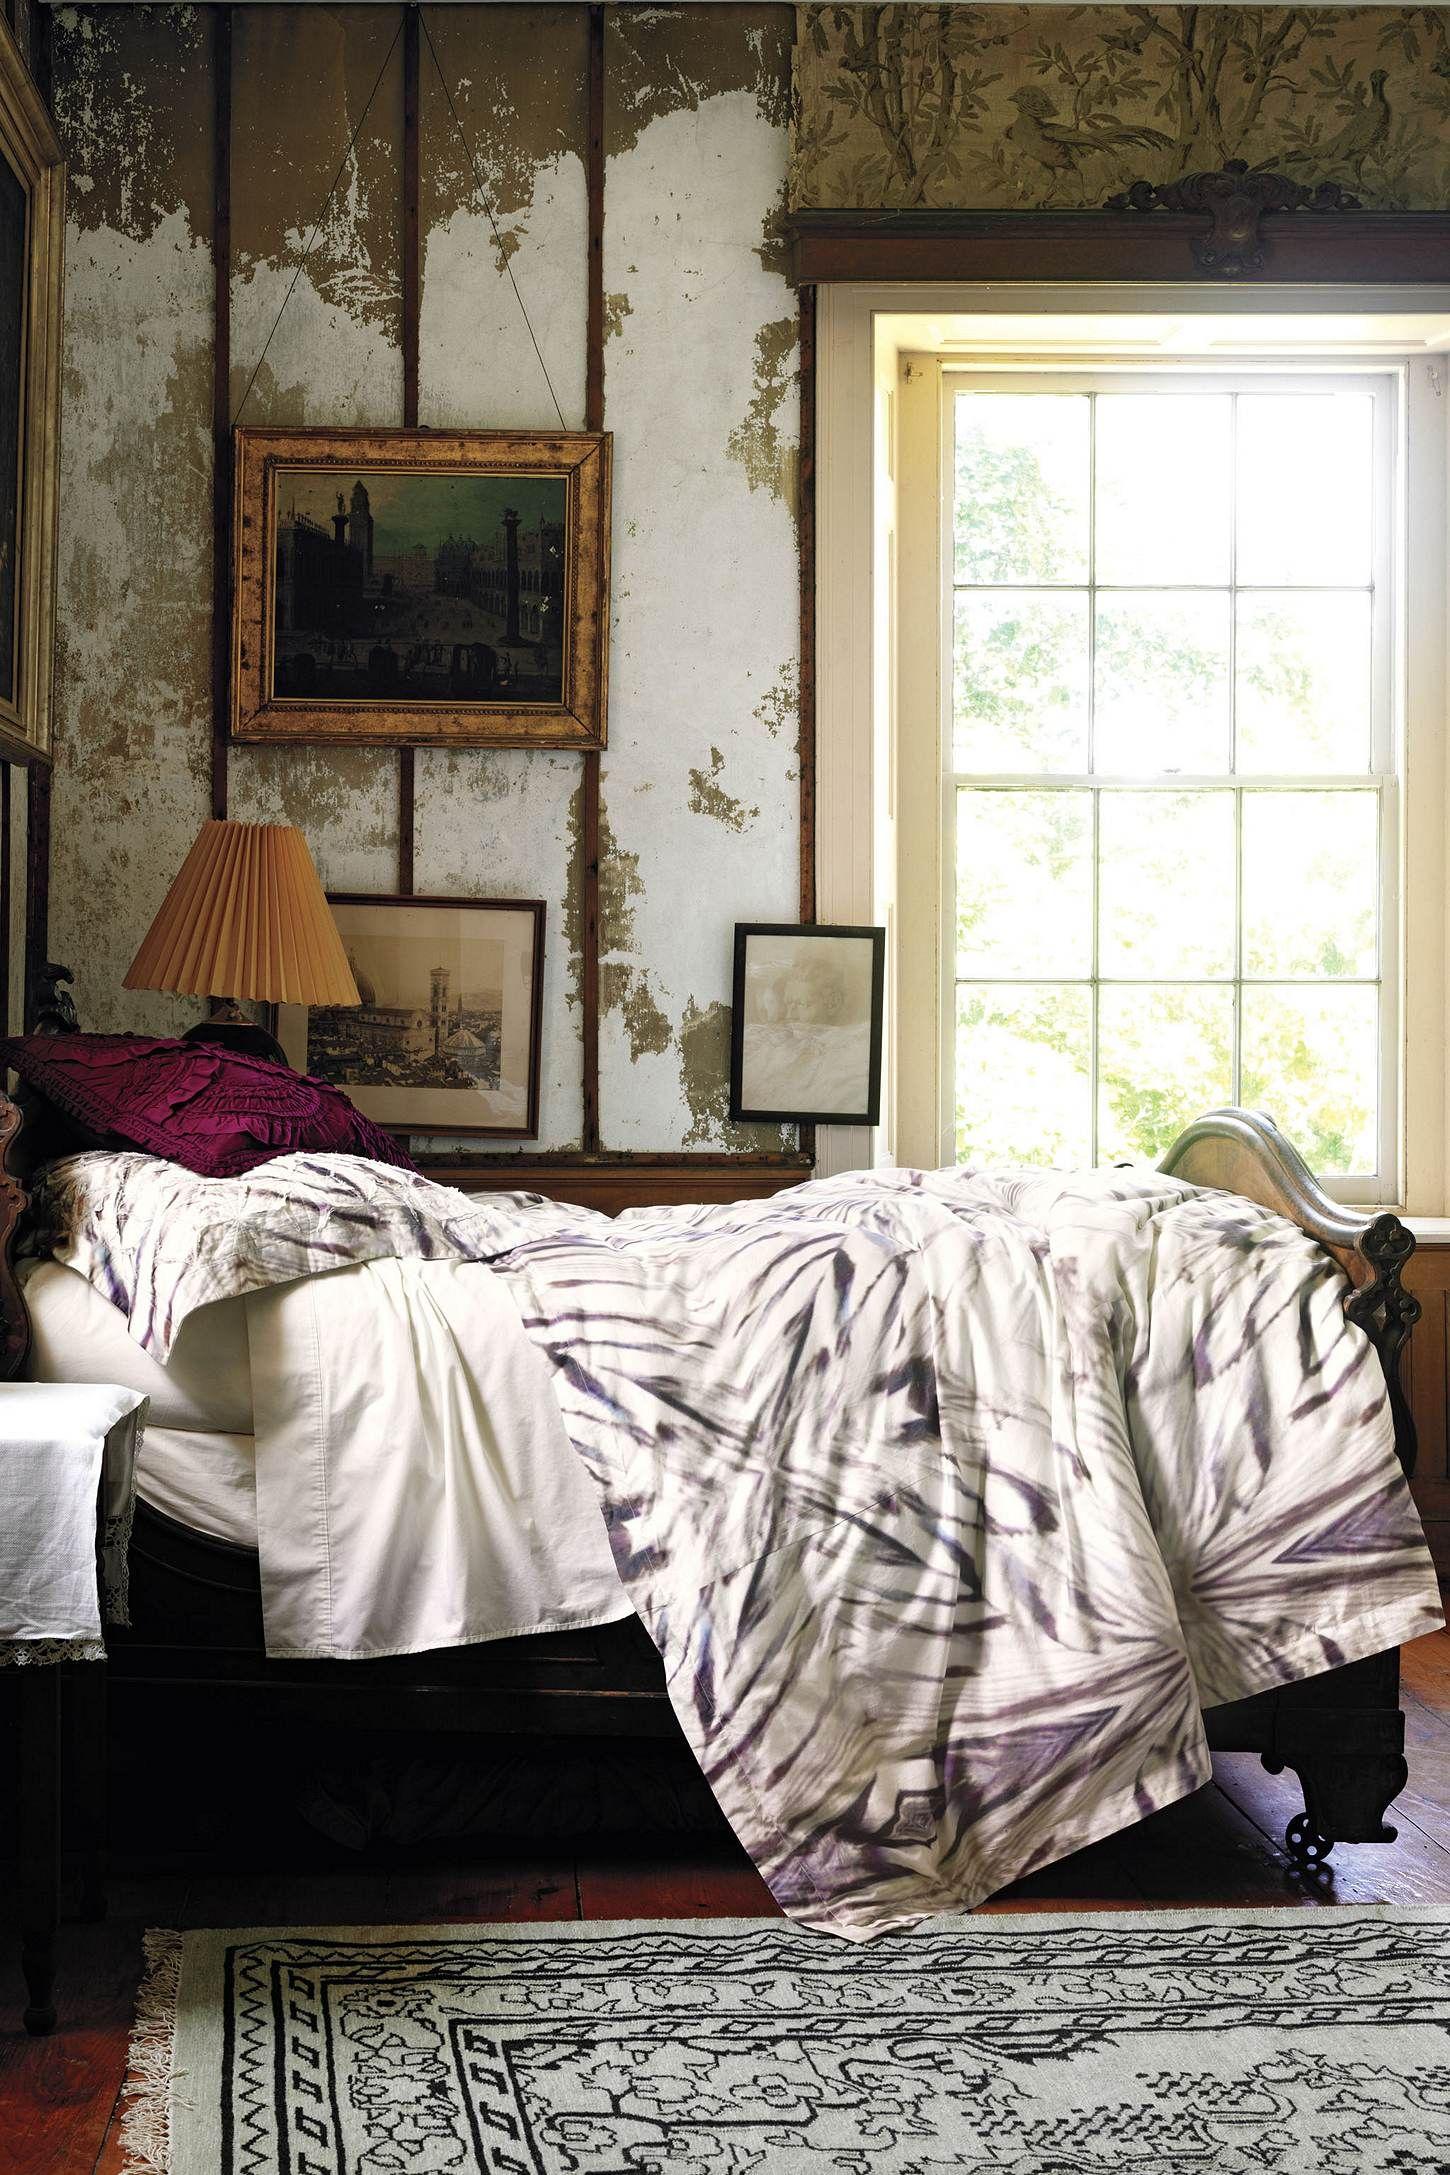 Anthropologie Bedroom: Rivulets Quilt In 2019